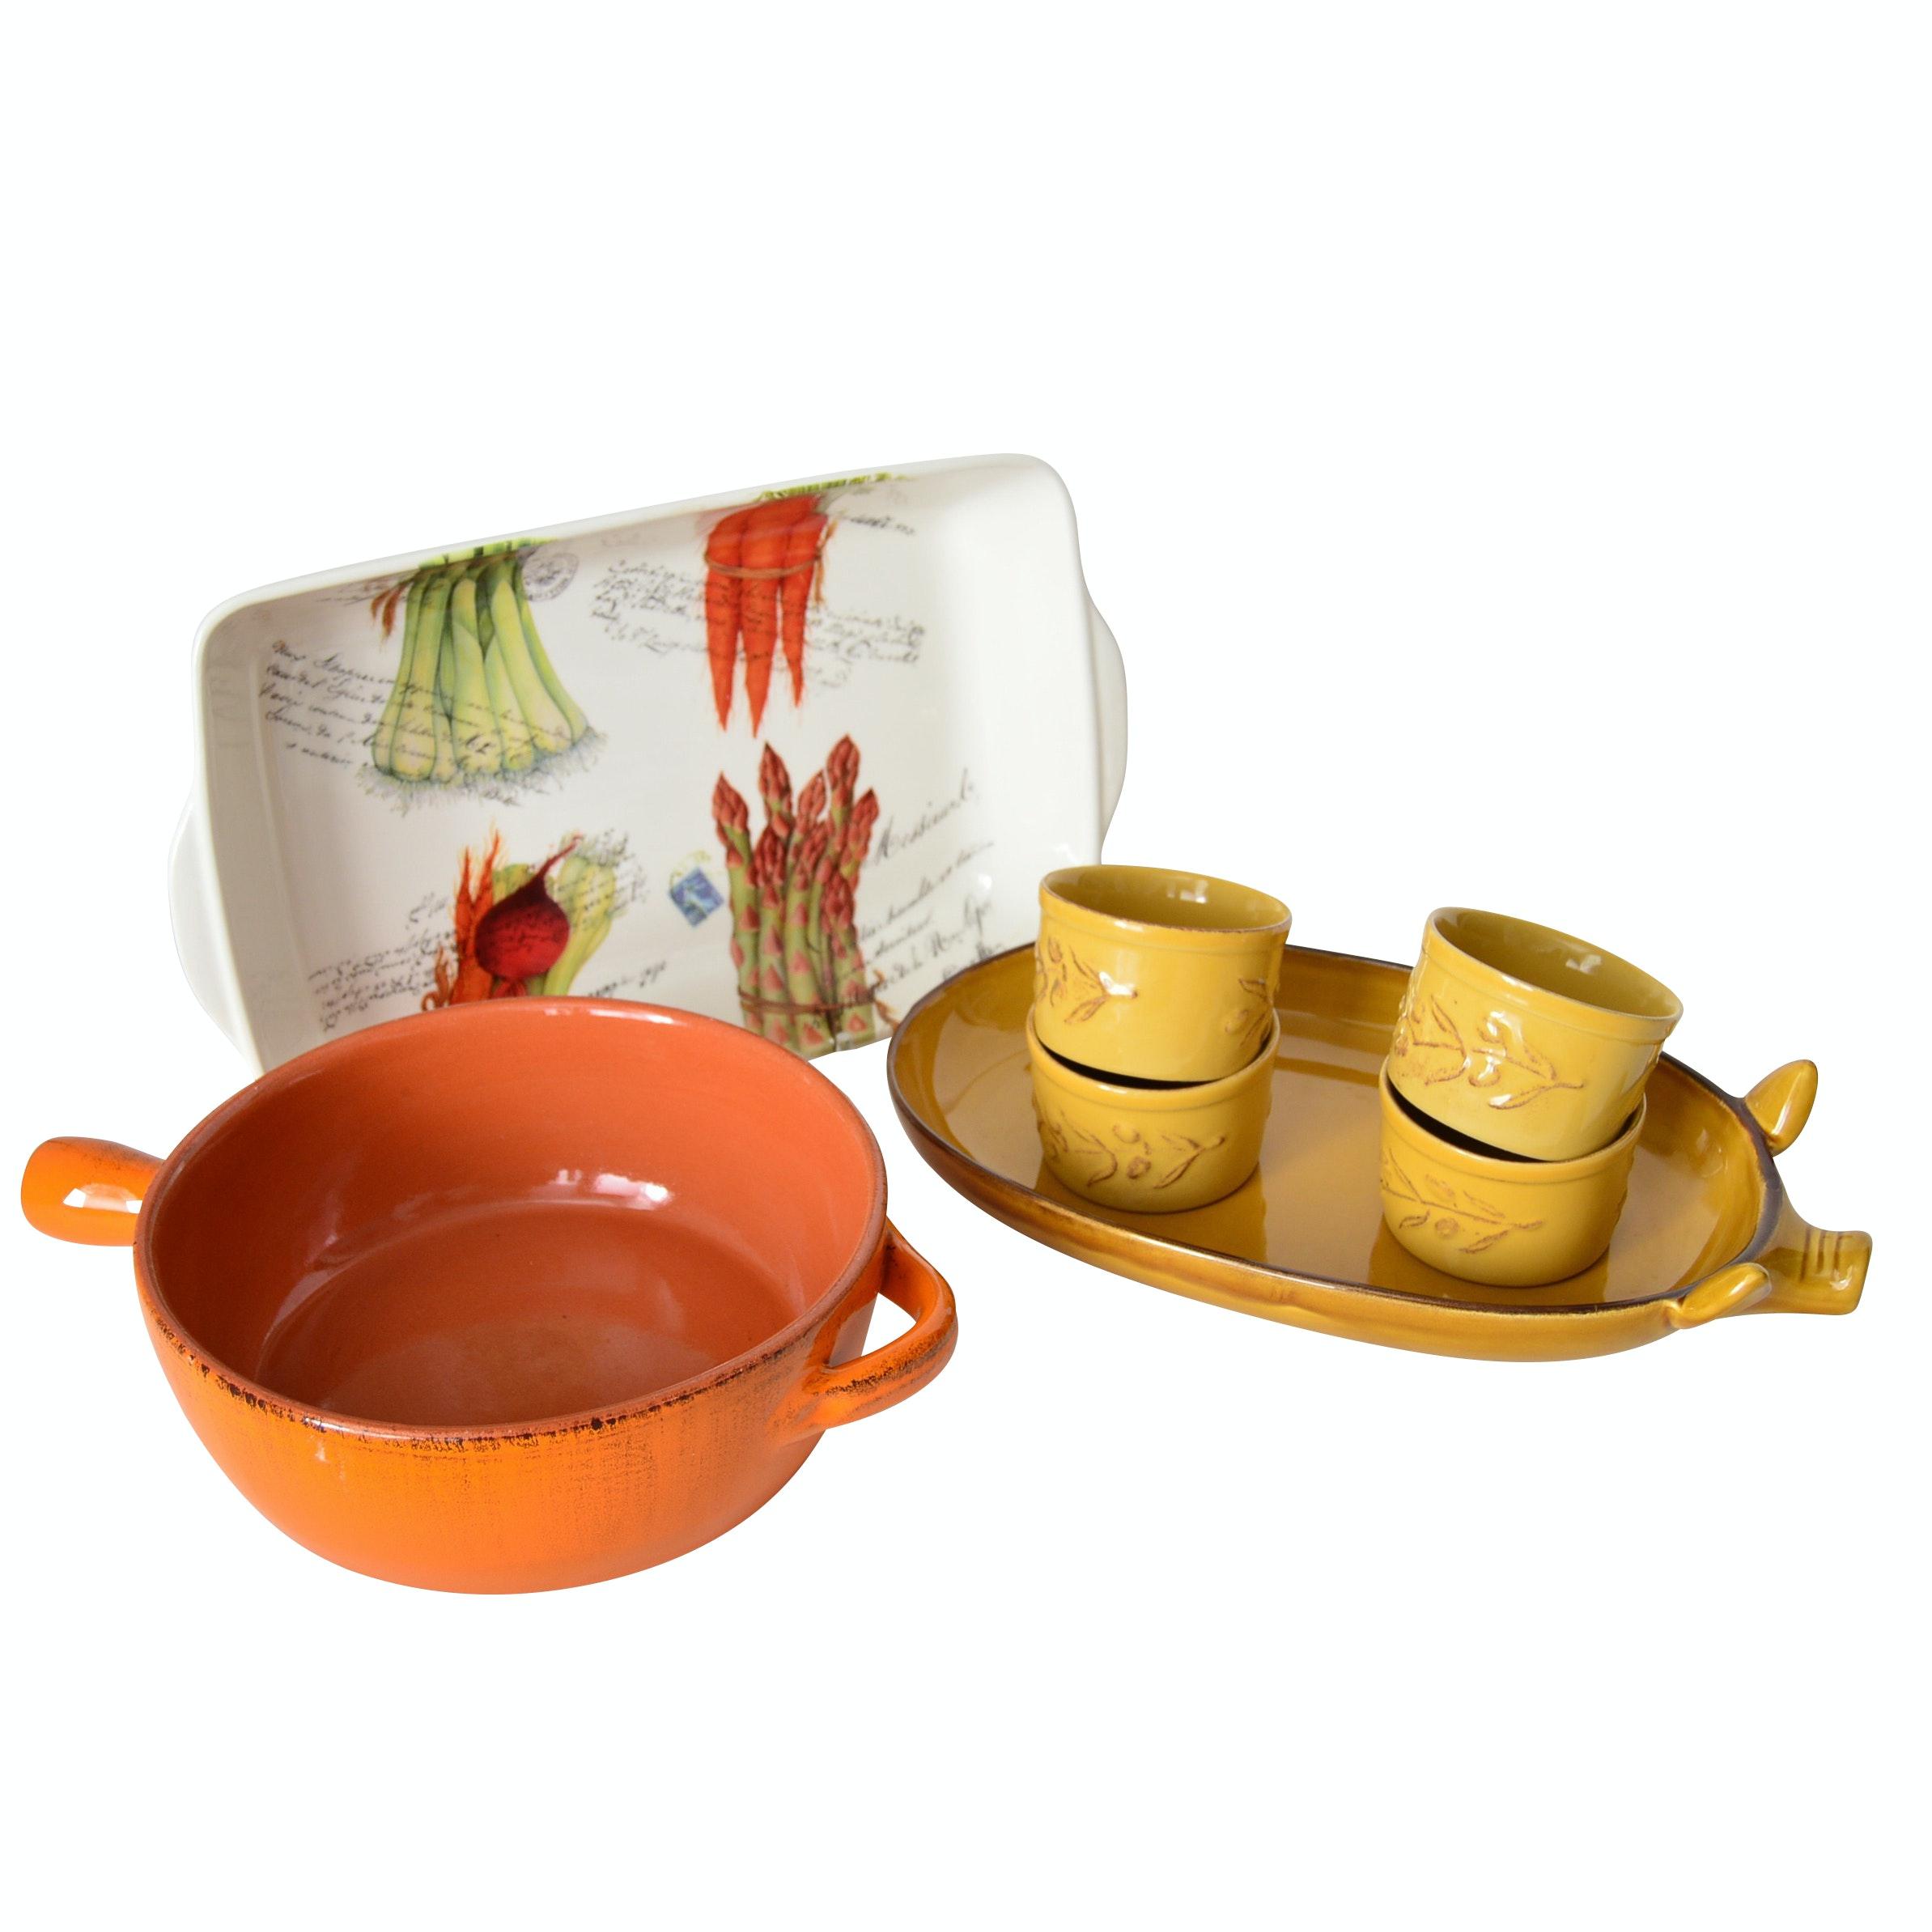 Italian and Portuguese Ceramic Bakeware and Serveware